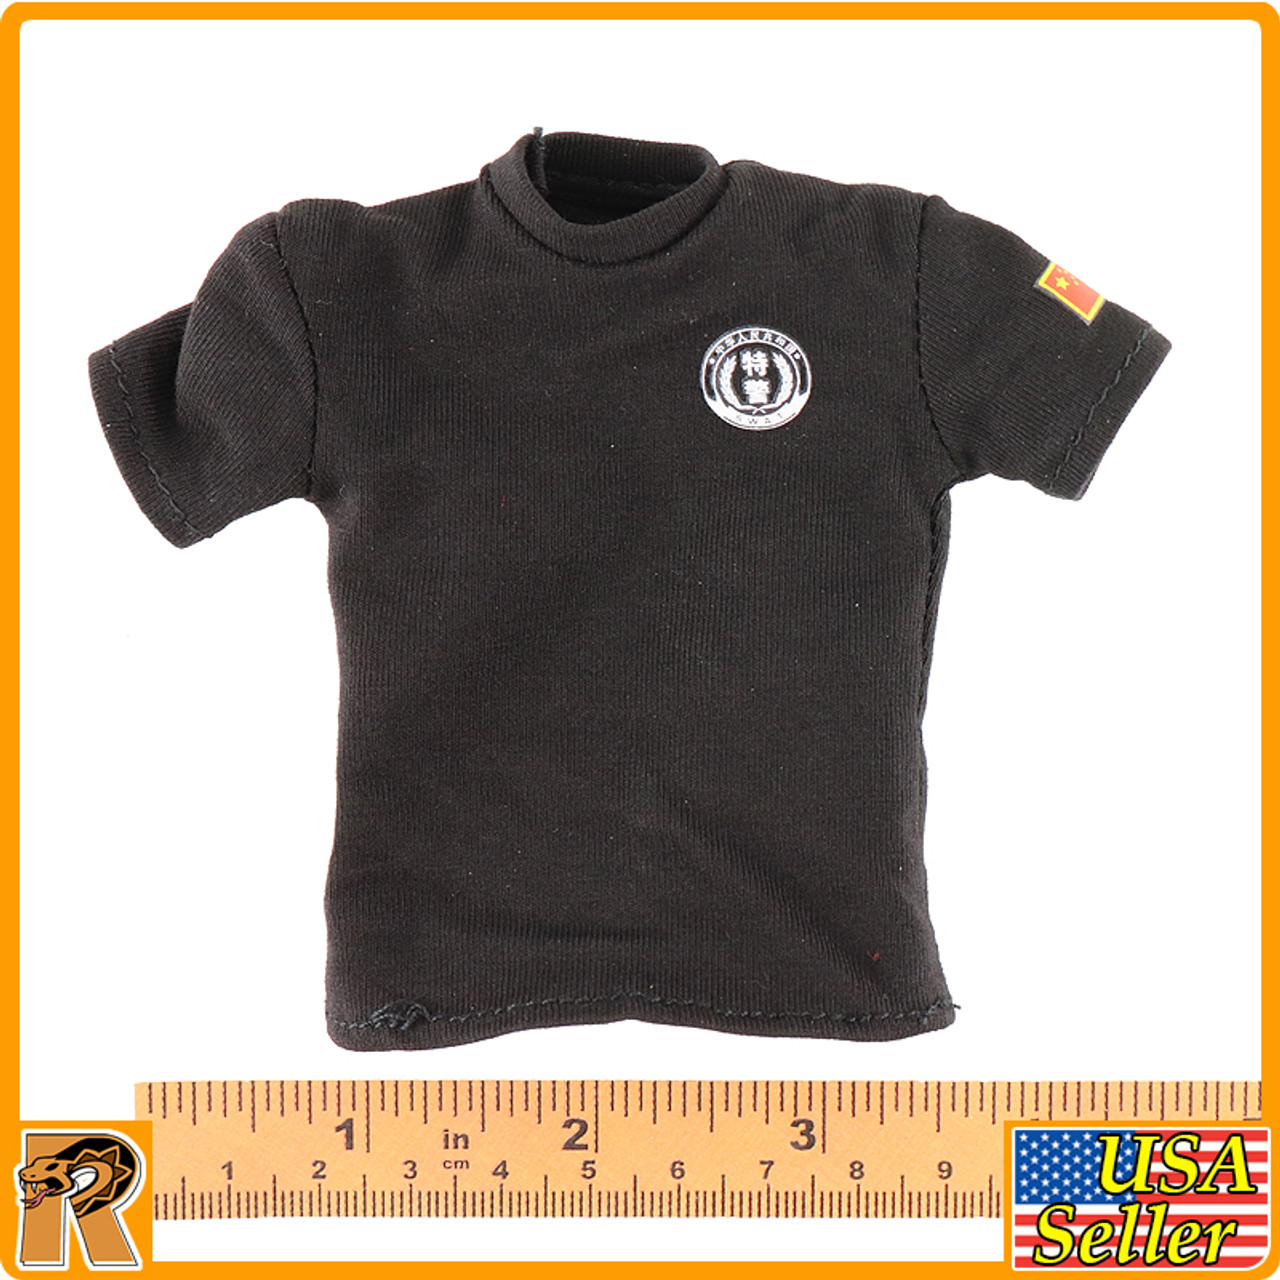 China SWAT Shandian Commando - BlacK T Shirt - 1/6 Scale -